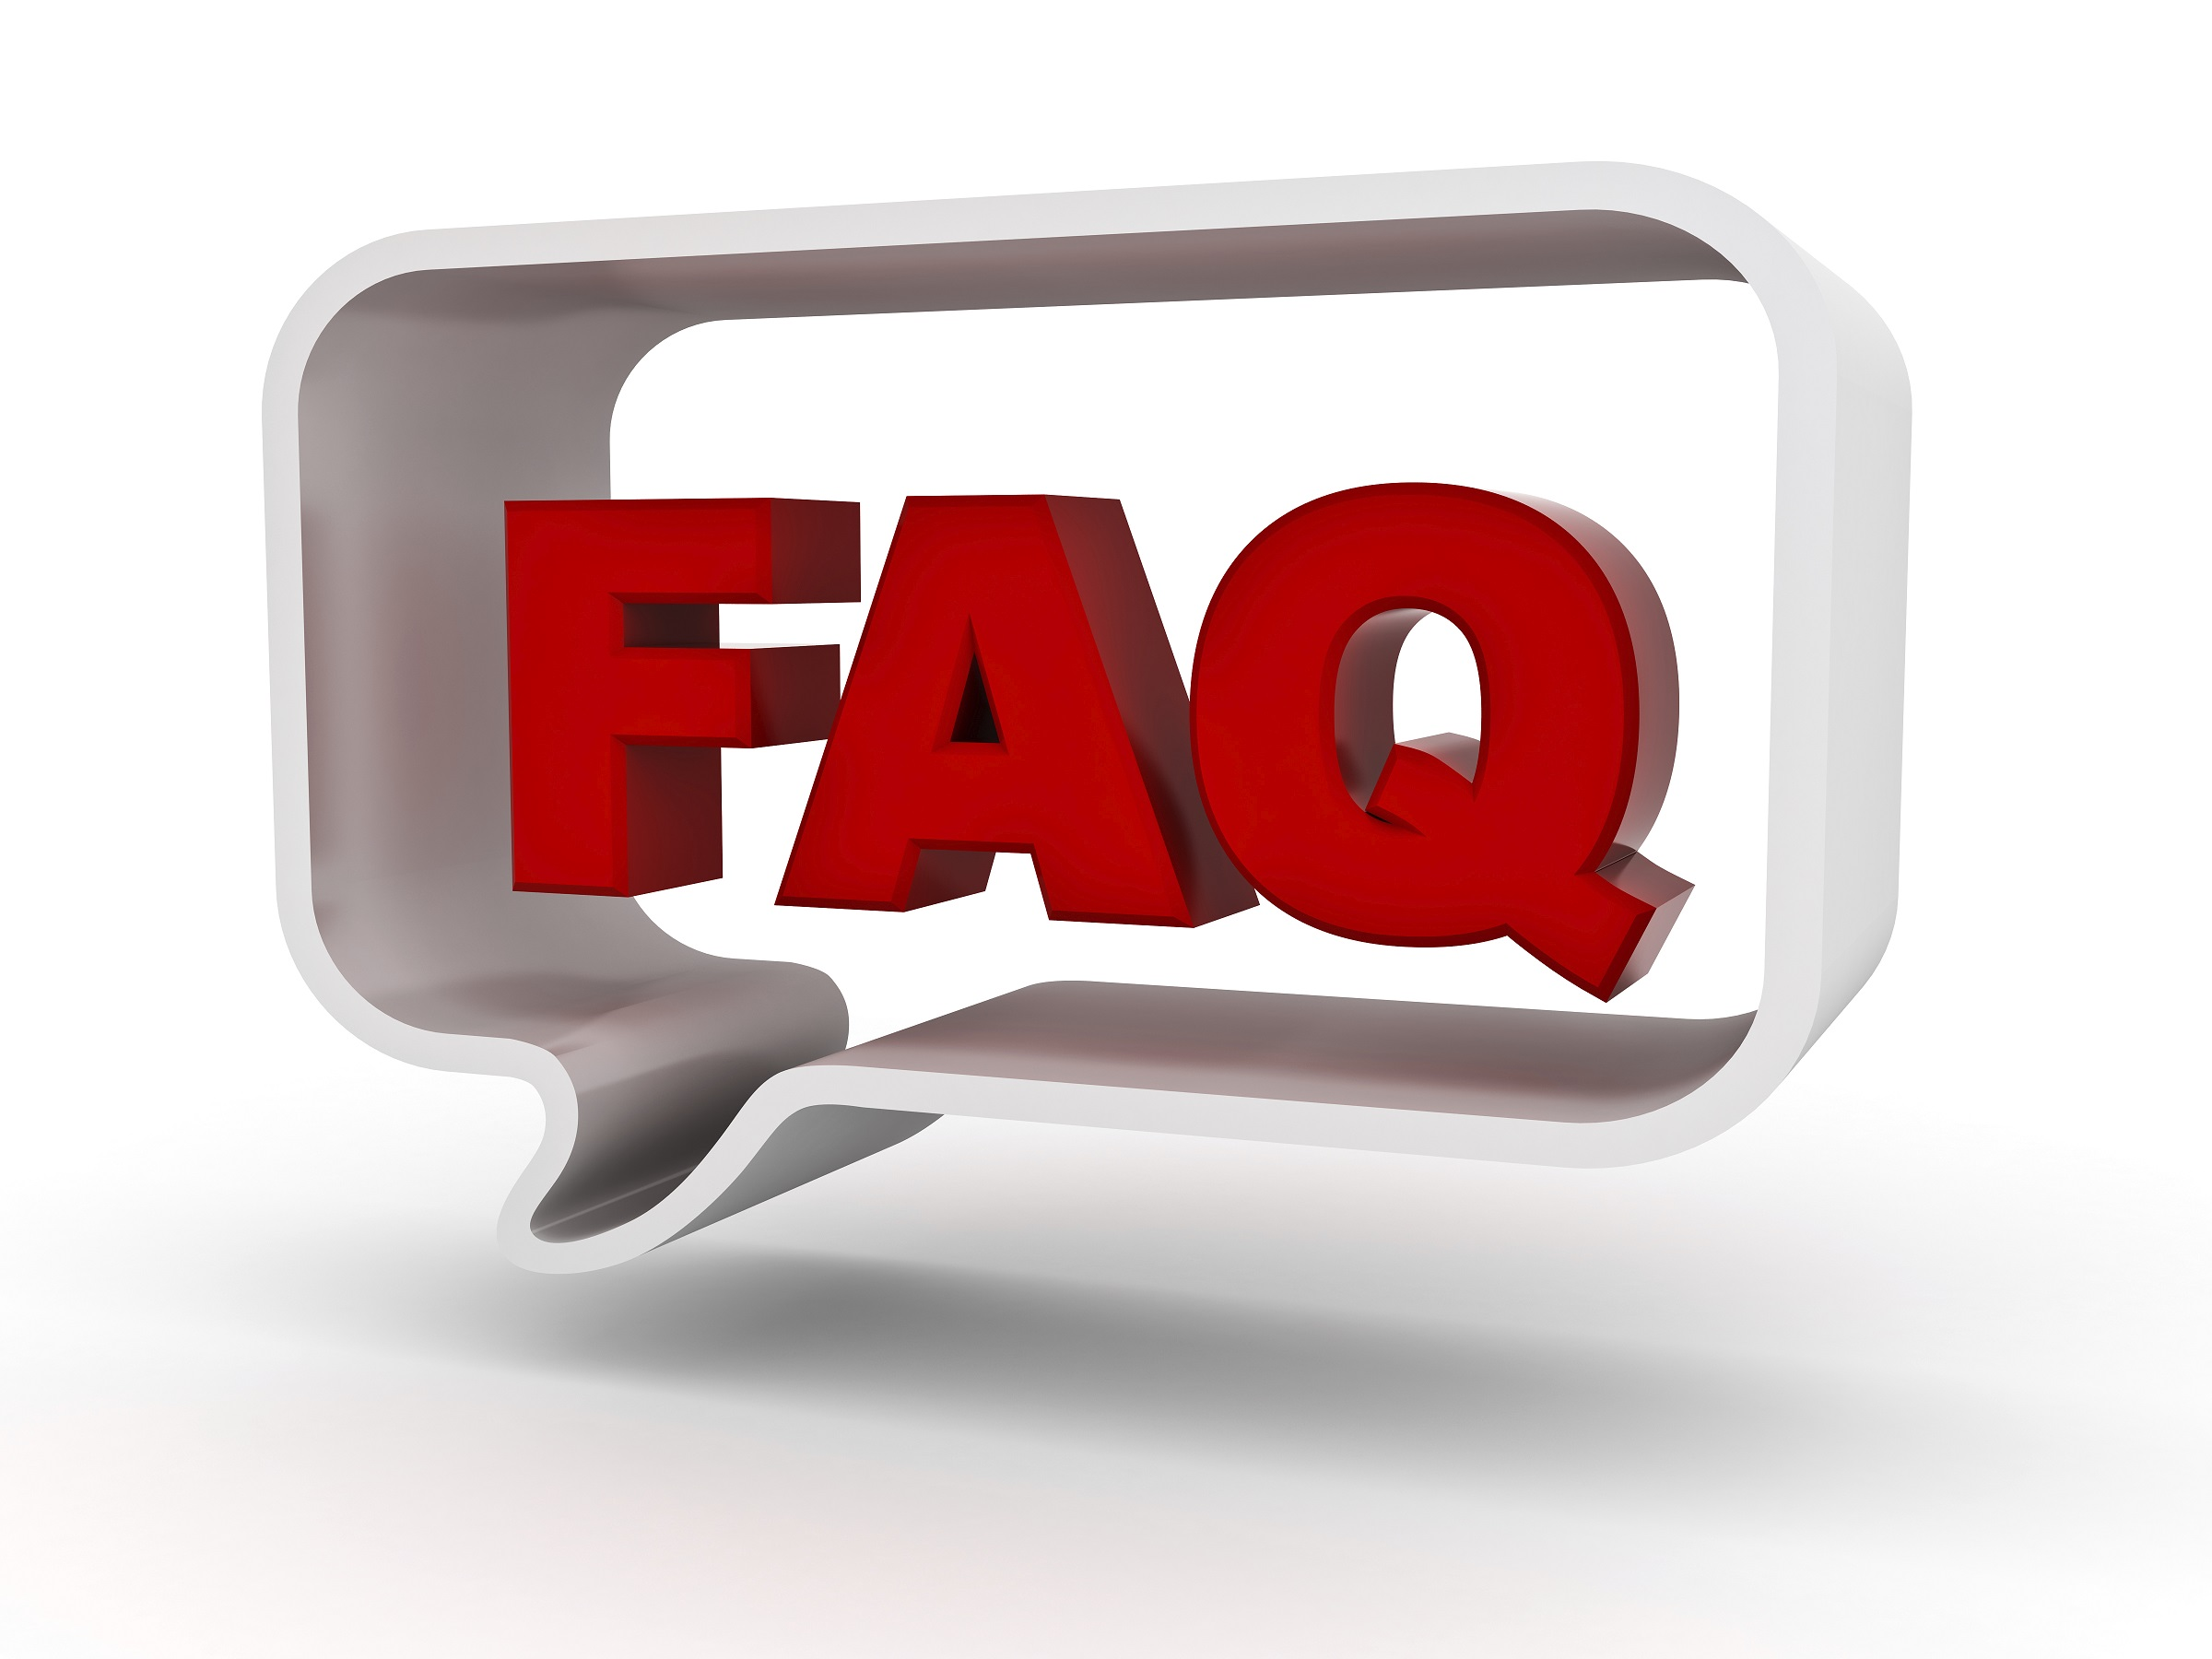 QUESTIONS DT DICT